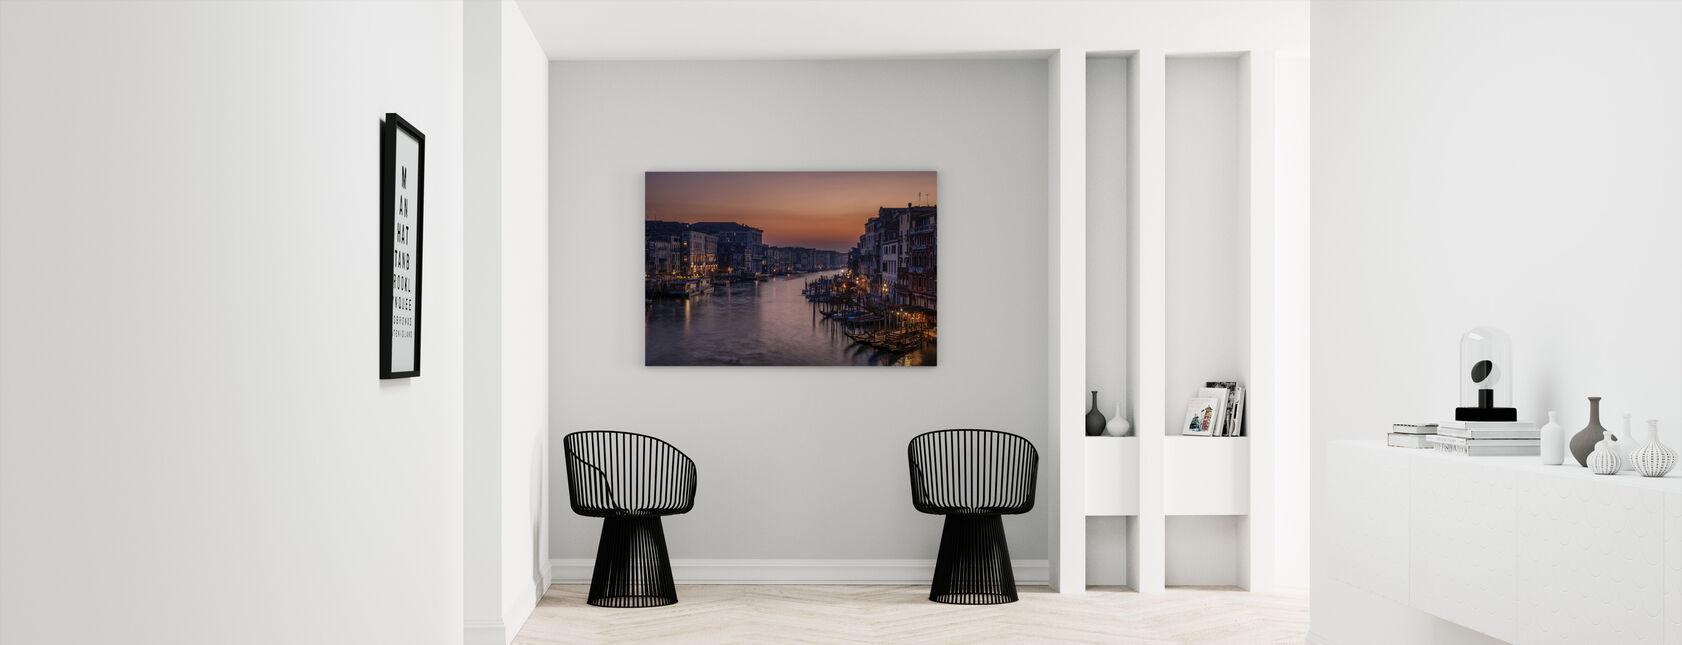 Venice Grand Canal vid Sunset - Canvastavla - Hall